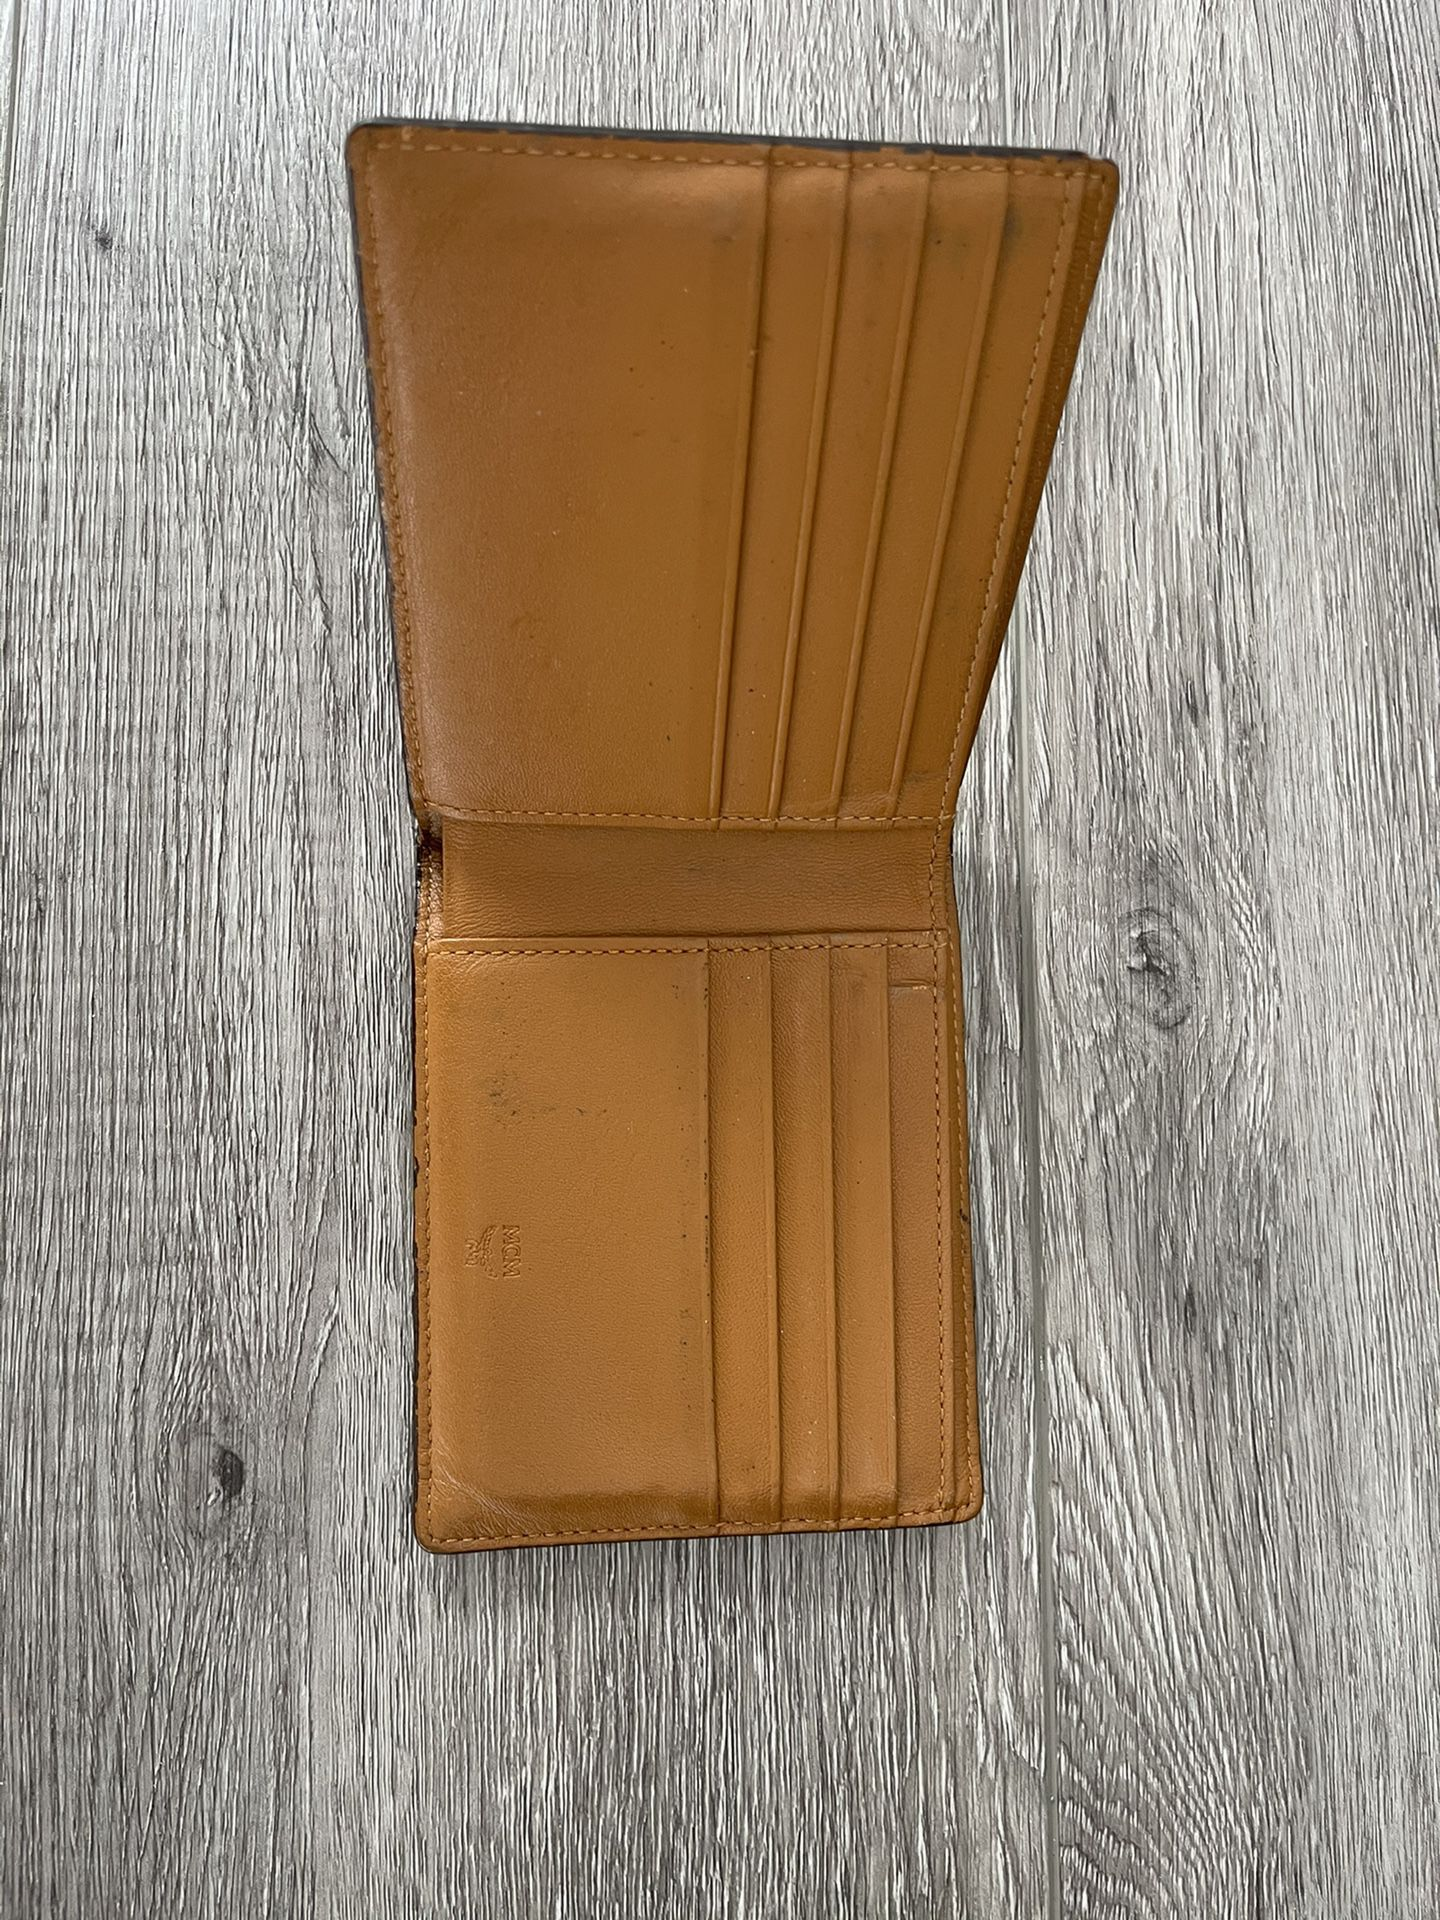 MCM Monogram Wallet Cognac